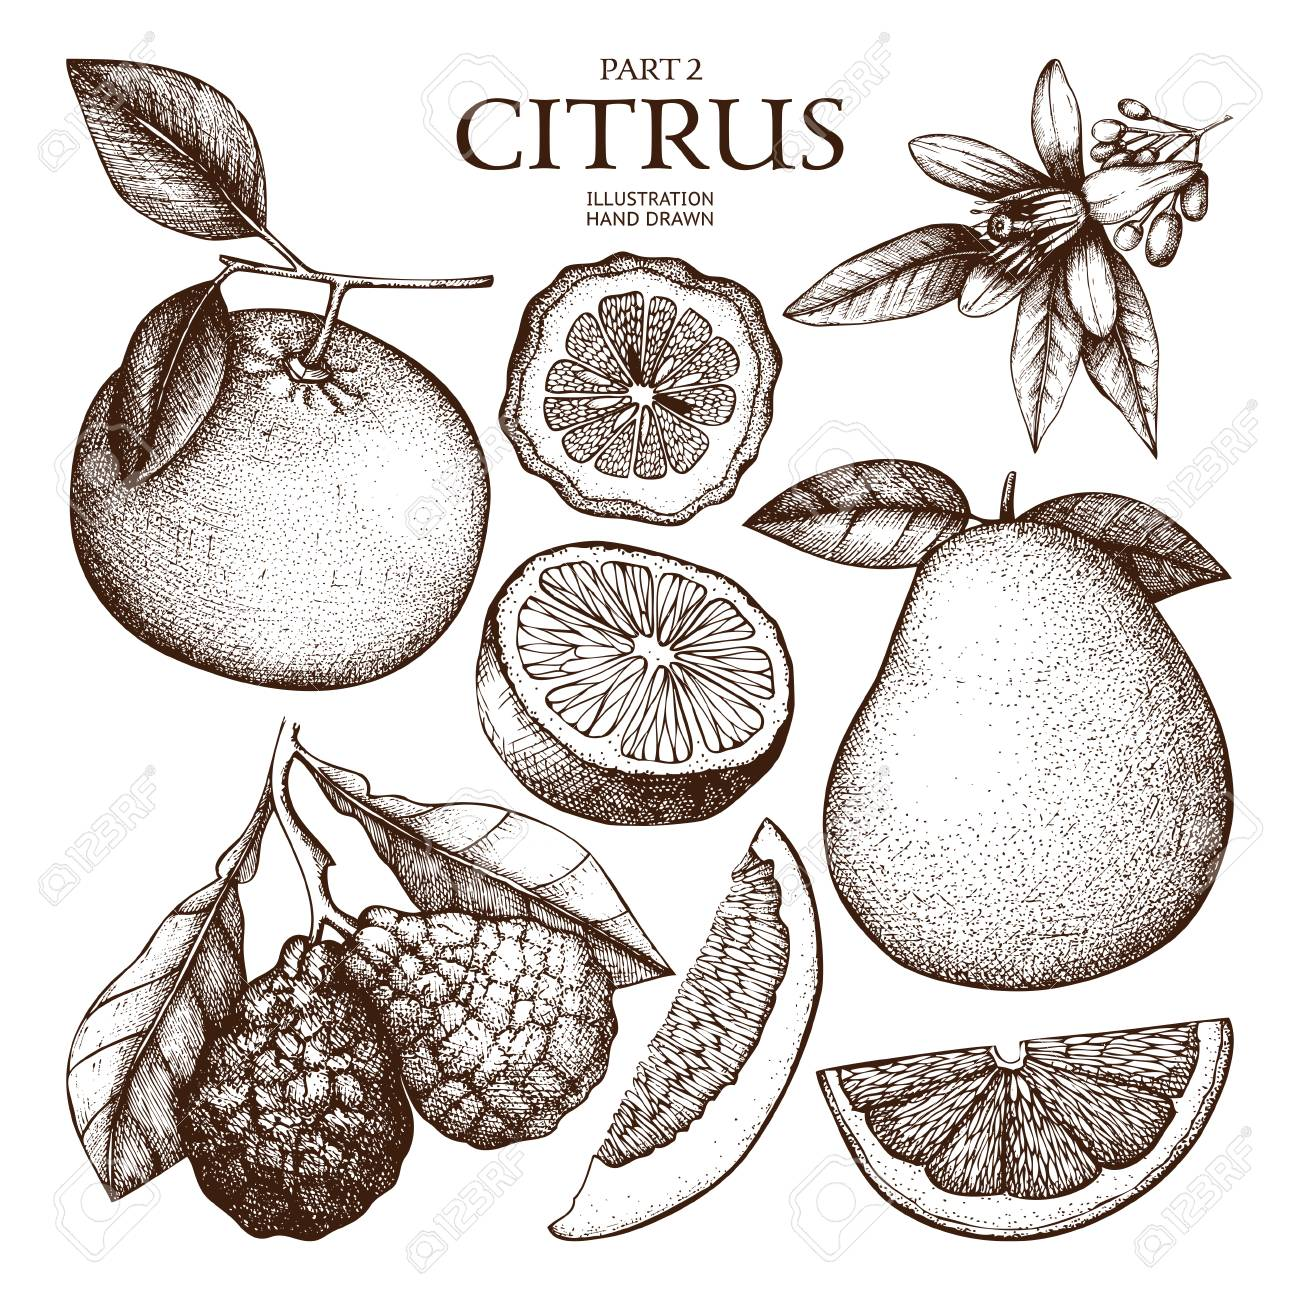 Ink hand drawn citrus plants sketch - 74950676